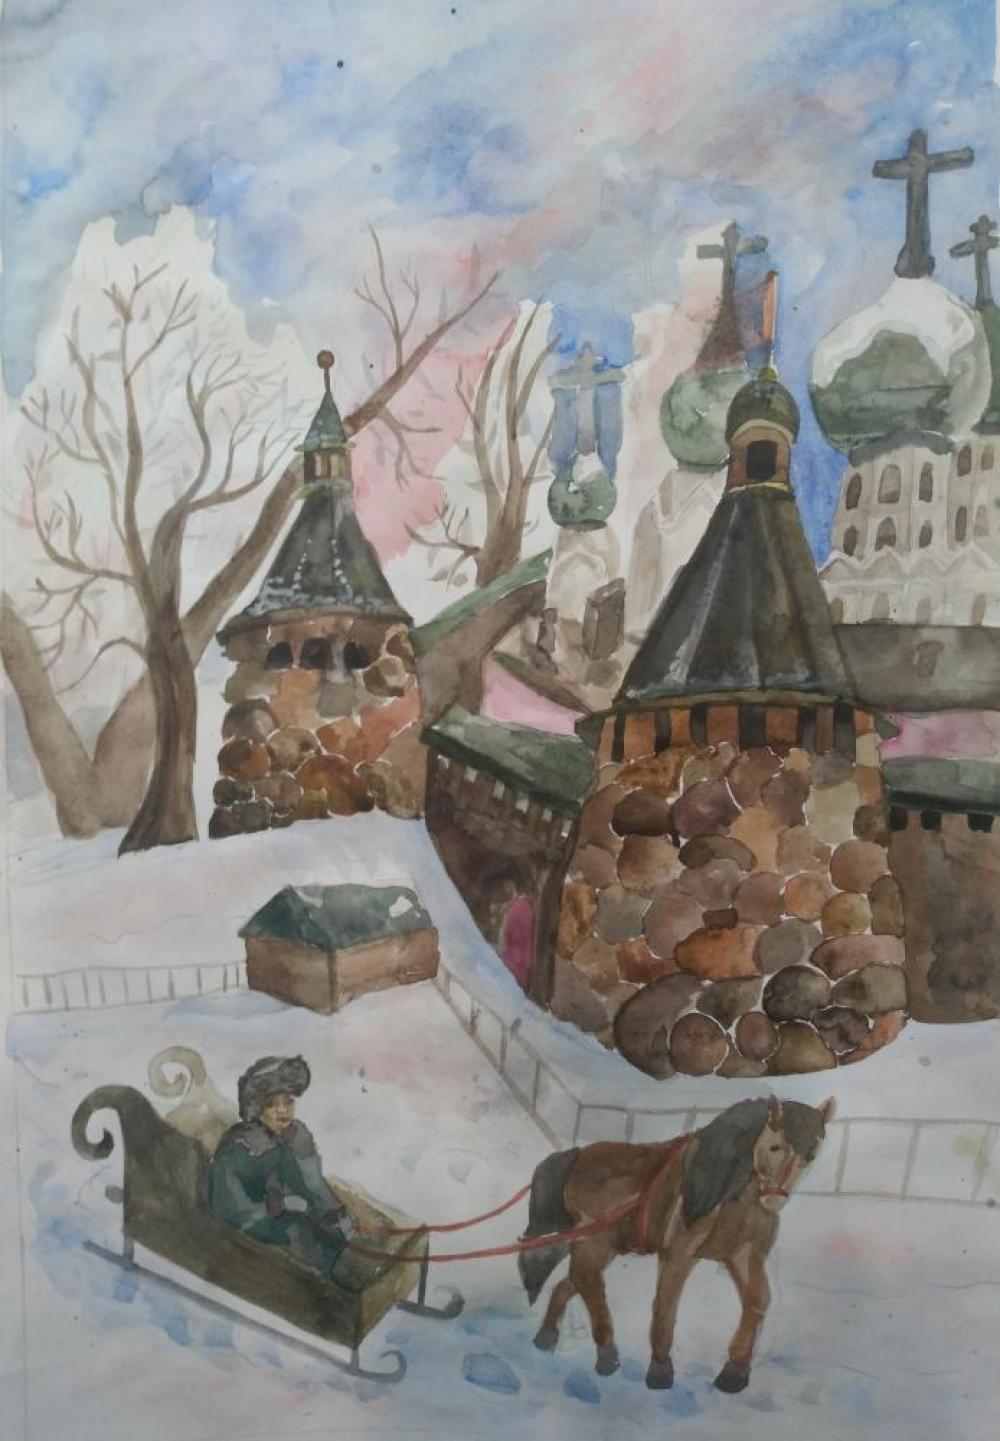 Герасимова А. Зима на Соловках